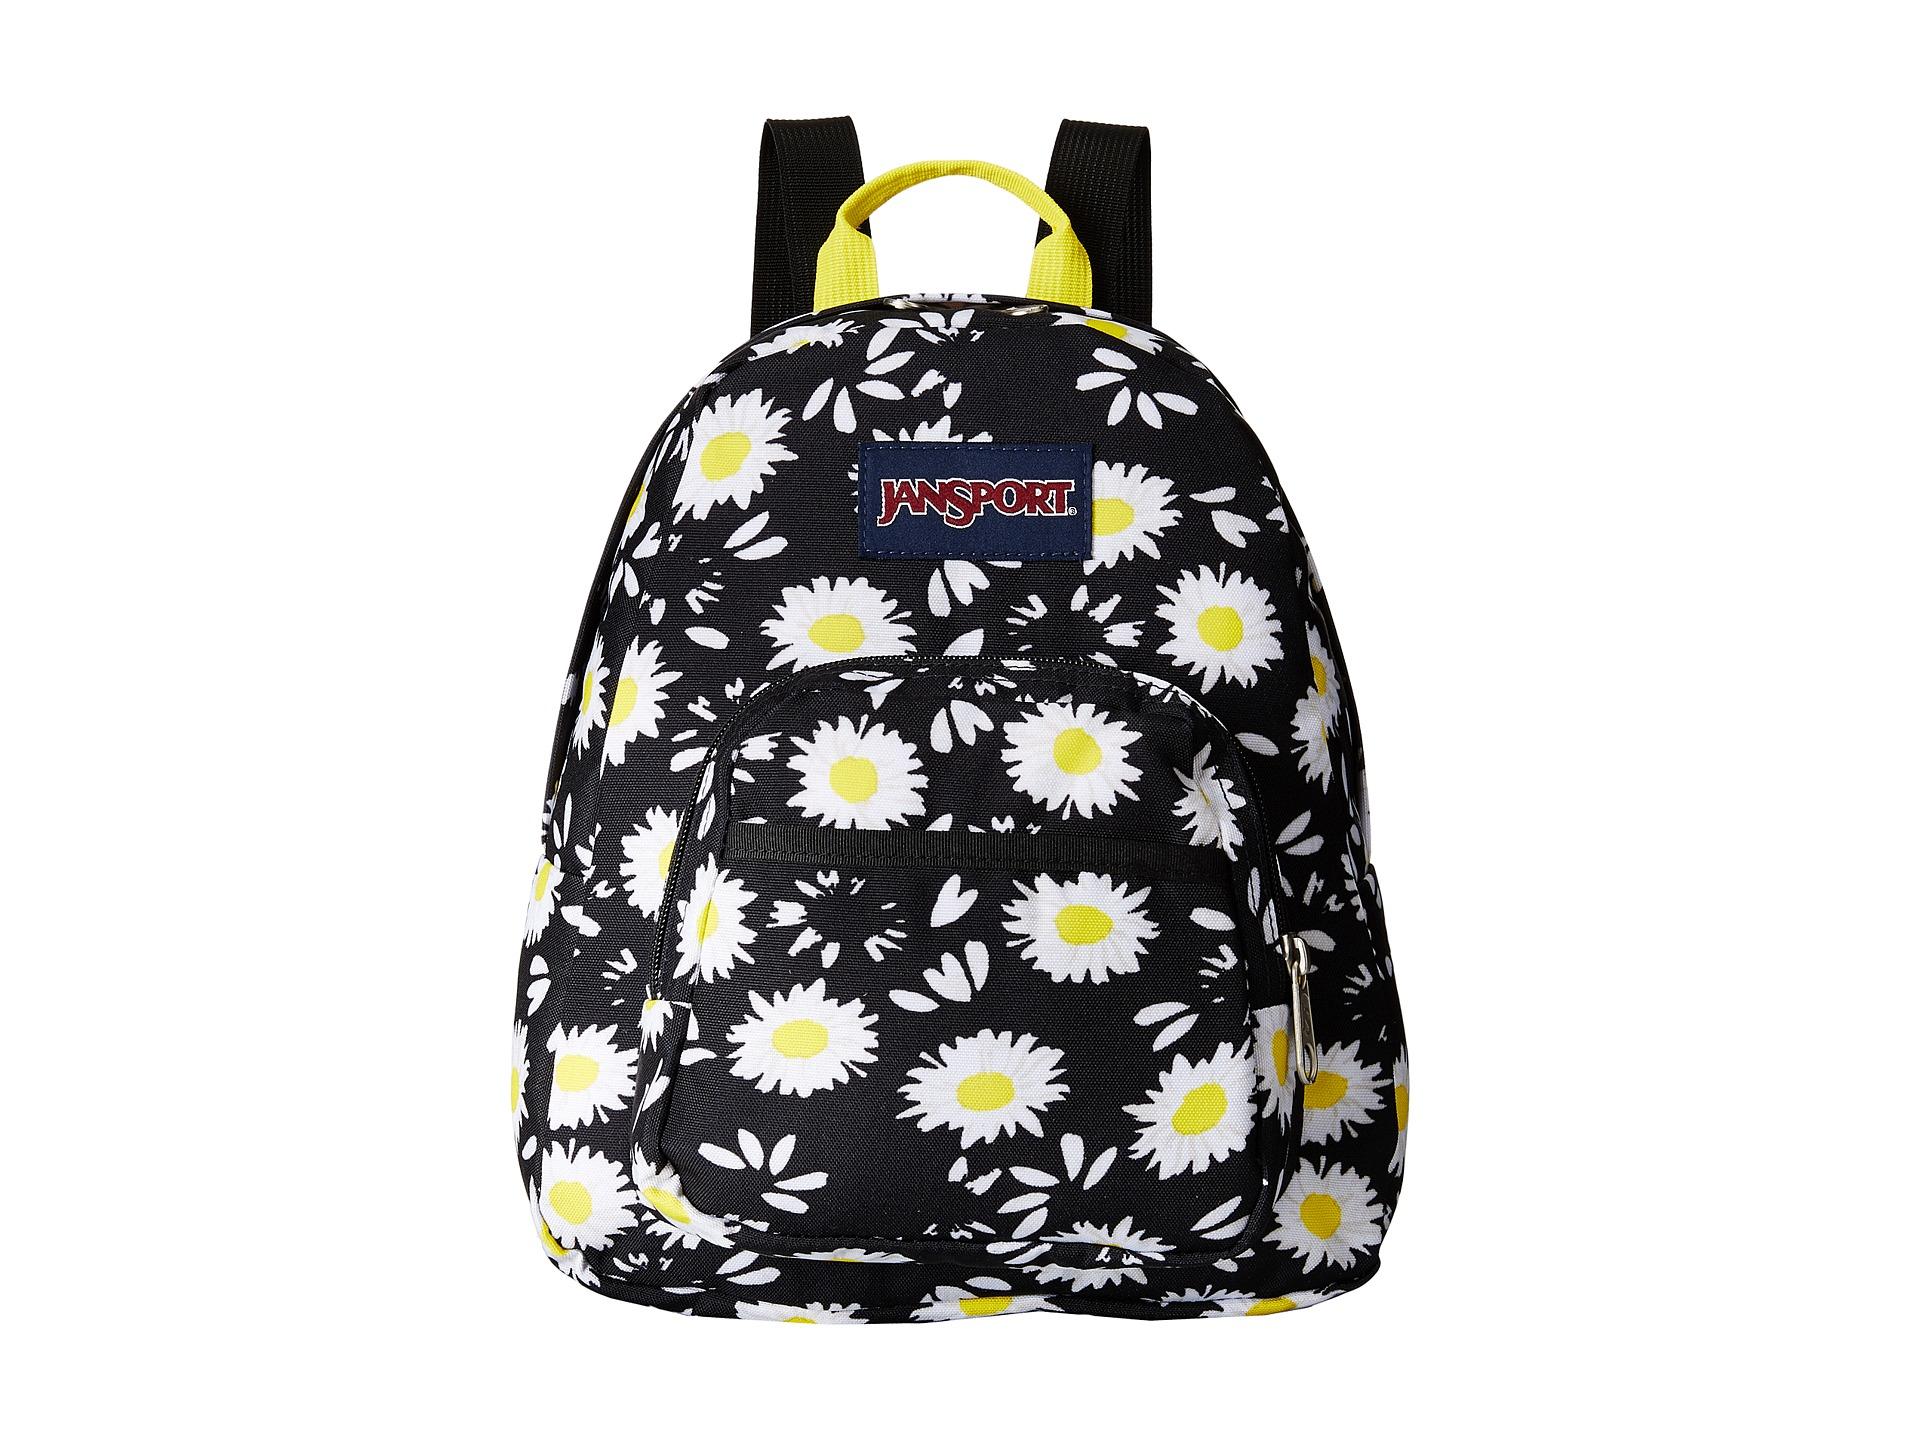 Cheap fashion backpacks uk